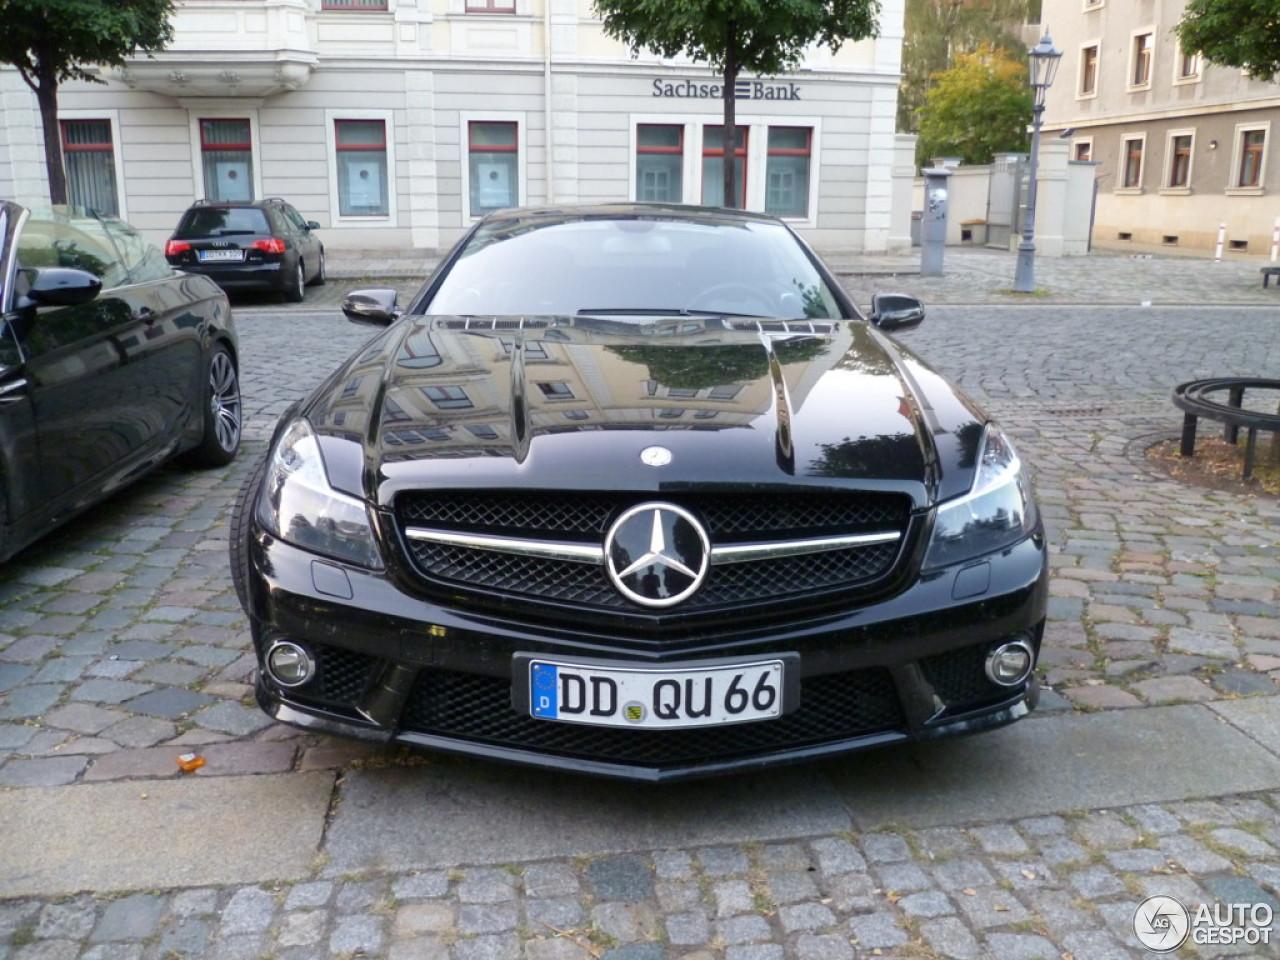 Mercedes benz sl 63 amg 20 november 2012 autogespot for Mercedes benz sl 63 amg